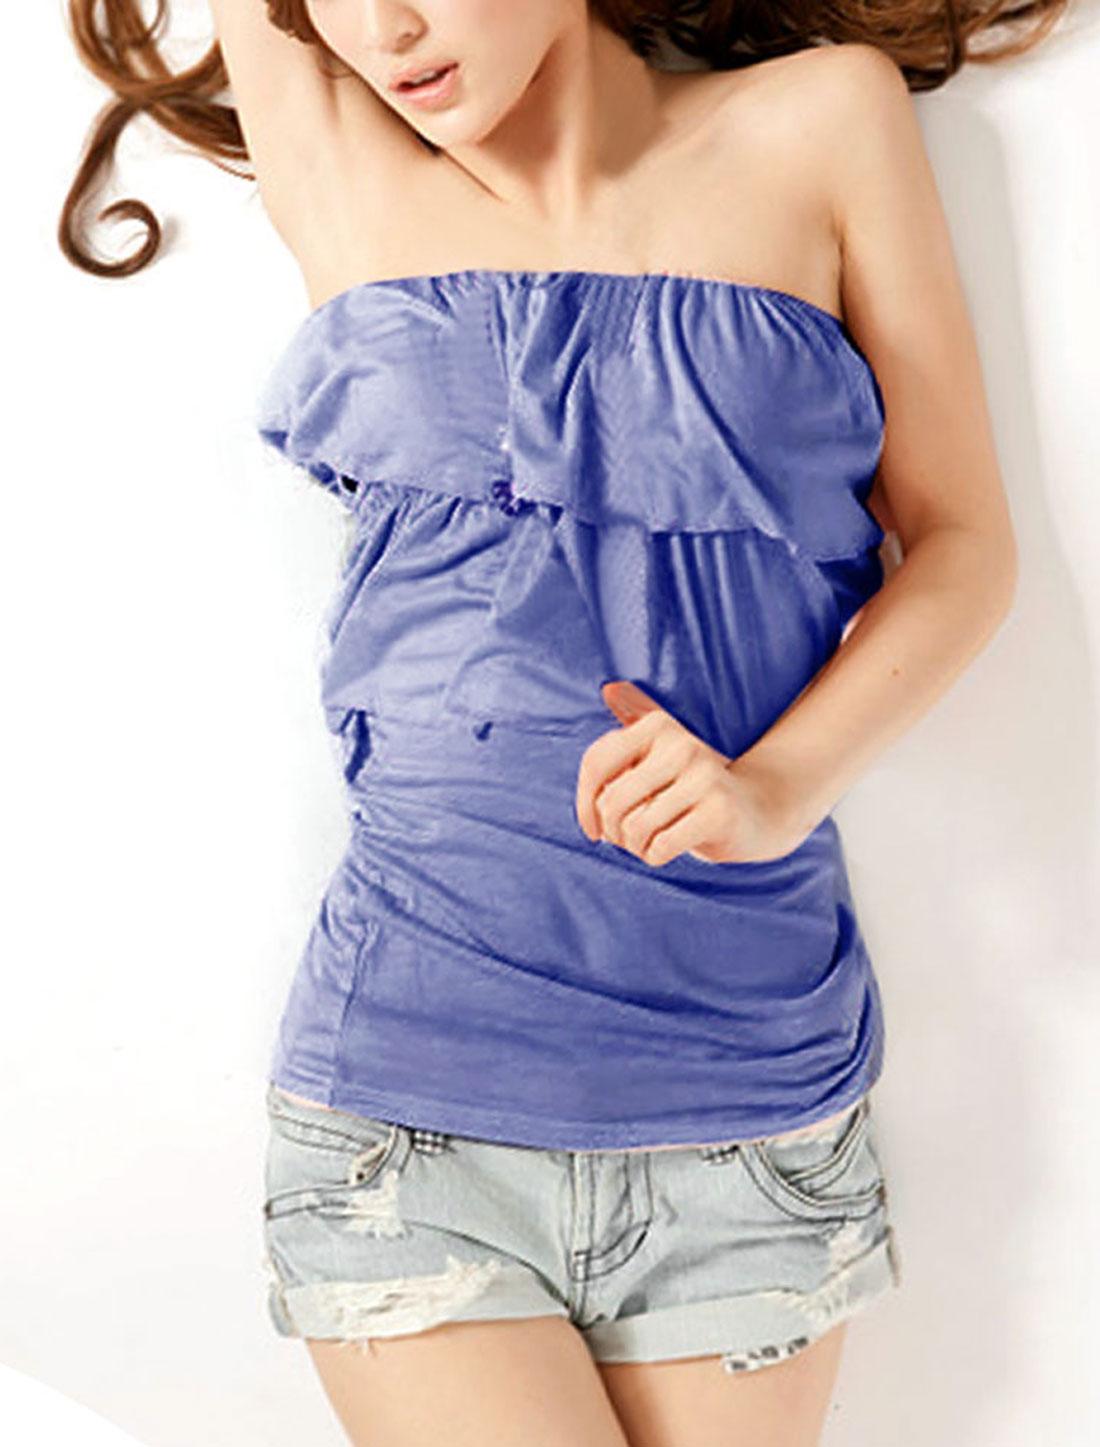 Lady Boat Neck Off Shoulder Style Ruffles Decor Shirt Top Blue XS